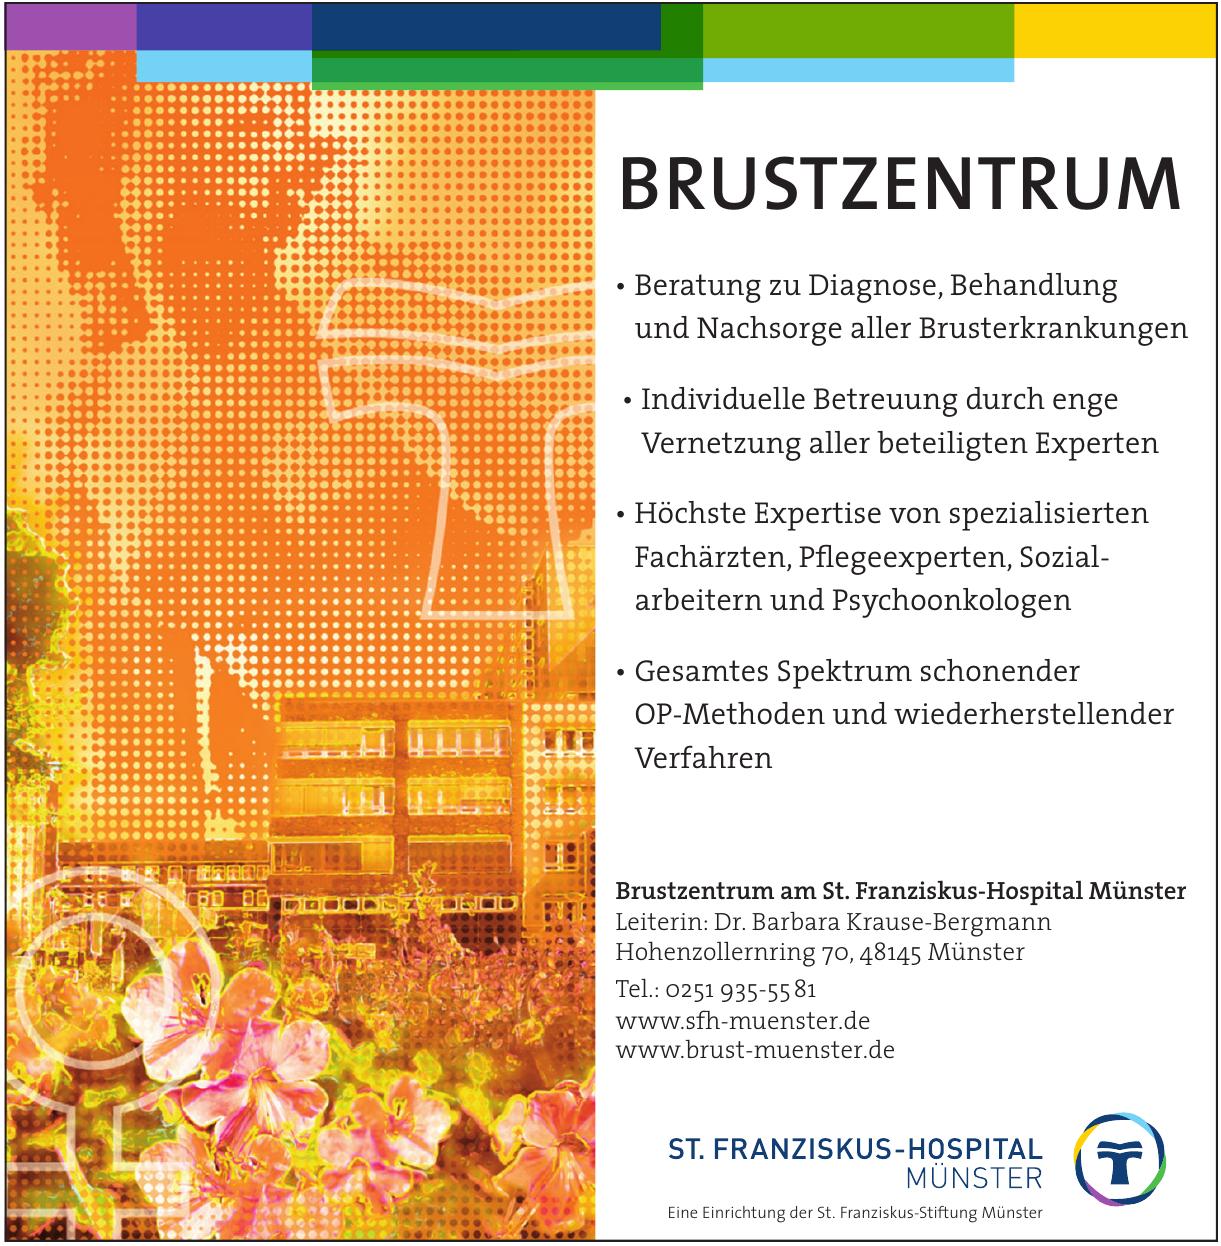 Brustzentrum am St. Franziskus-Hospital Münster